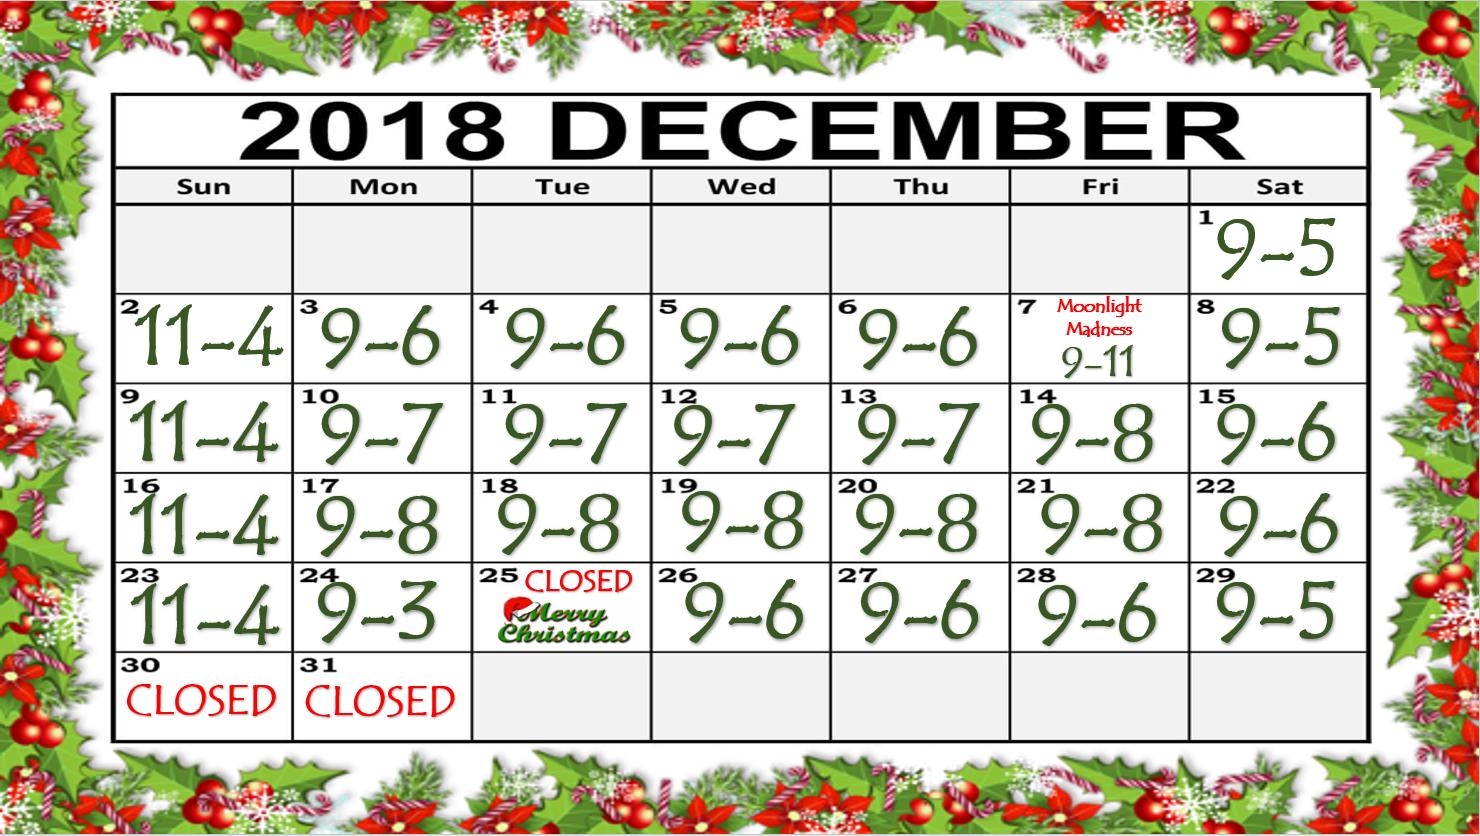 Snip December Calendar